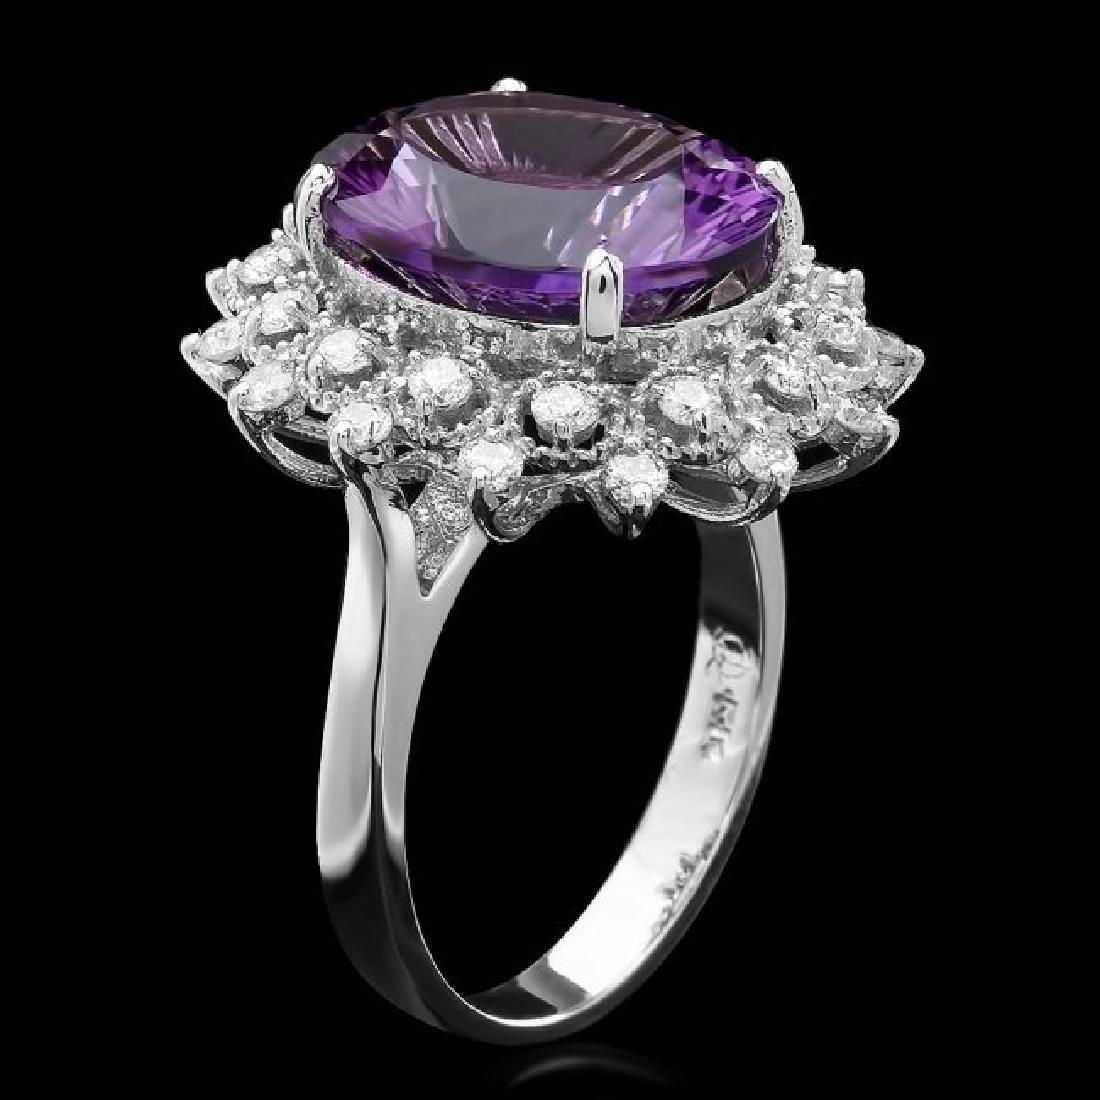 14k Gold 6.30ct Amethyst 0.80ct Diamond Ring - 2